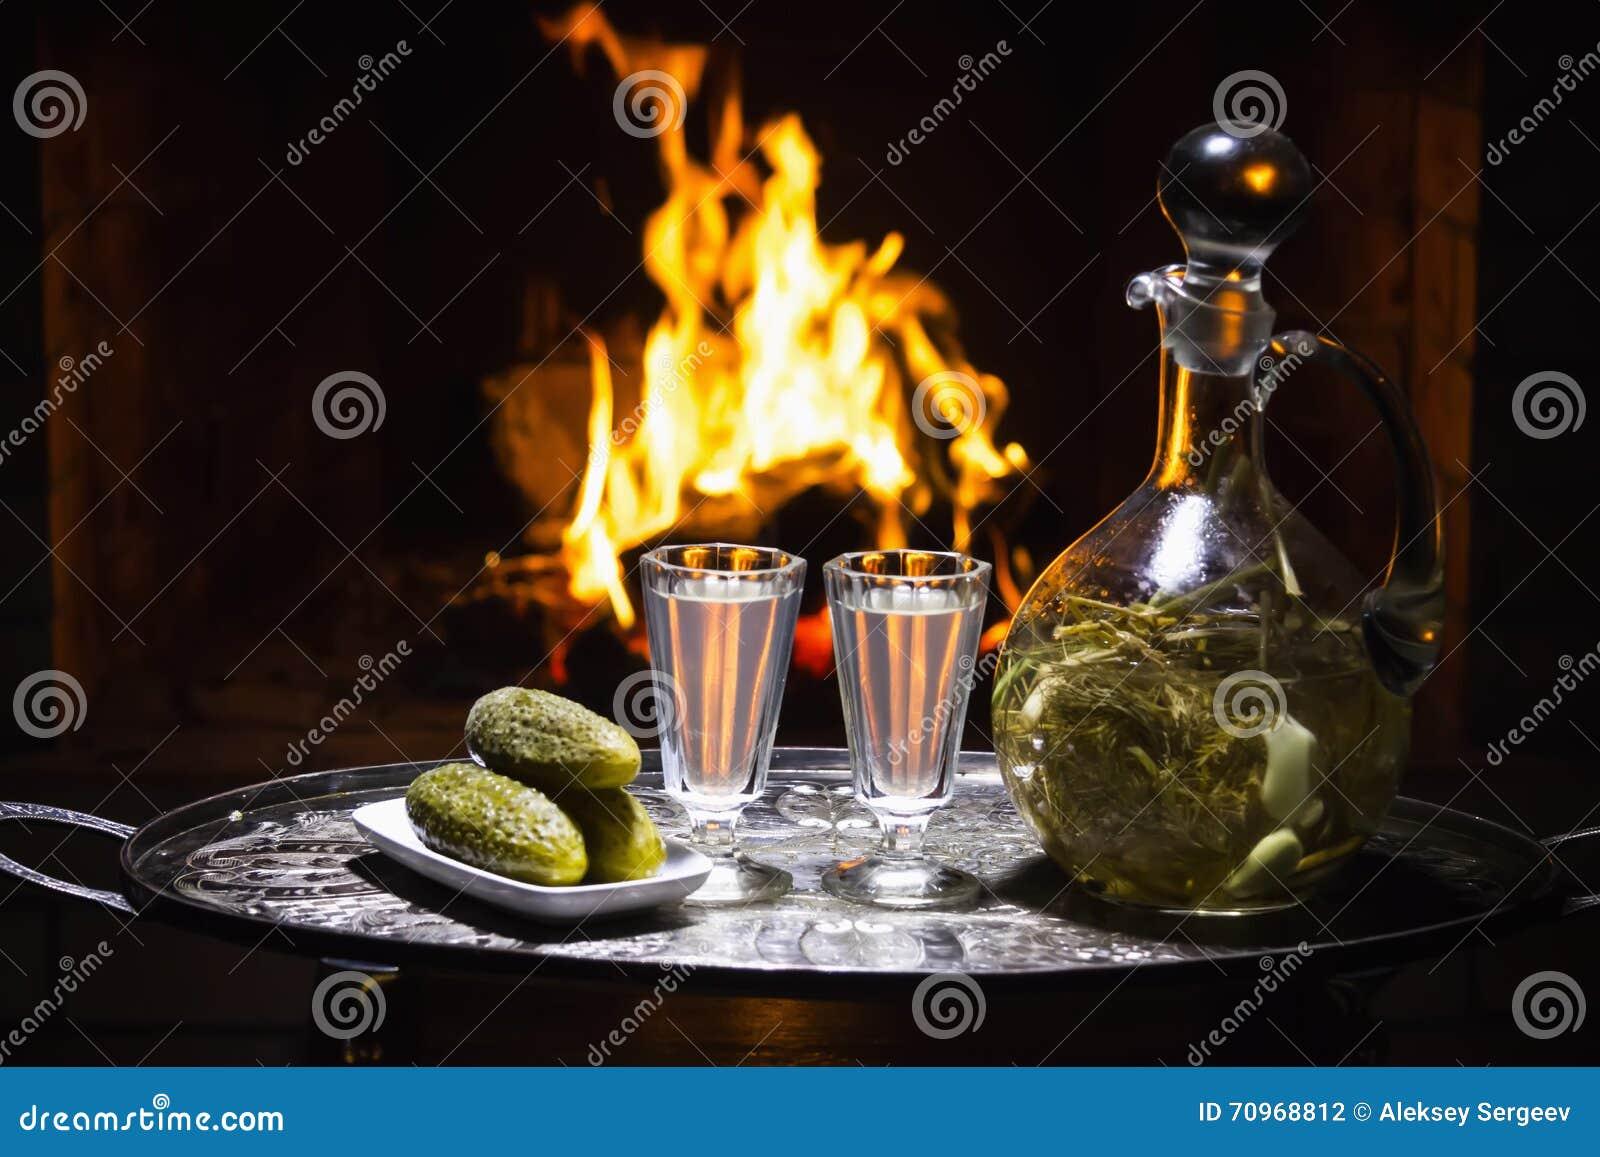 traditional homemade russian vodka stock photo image 70968812